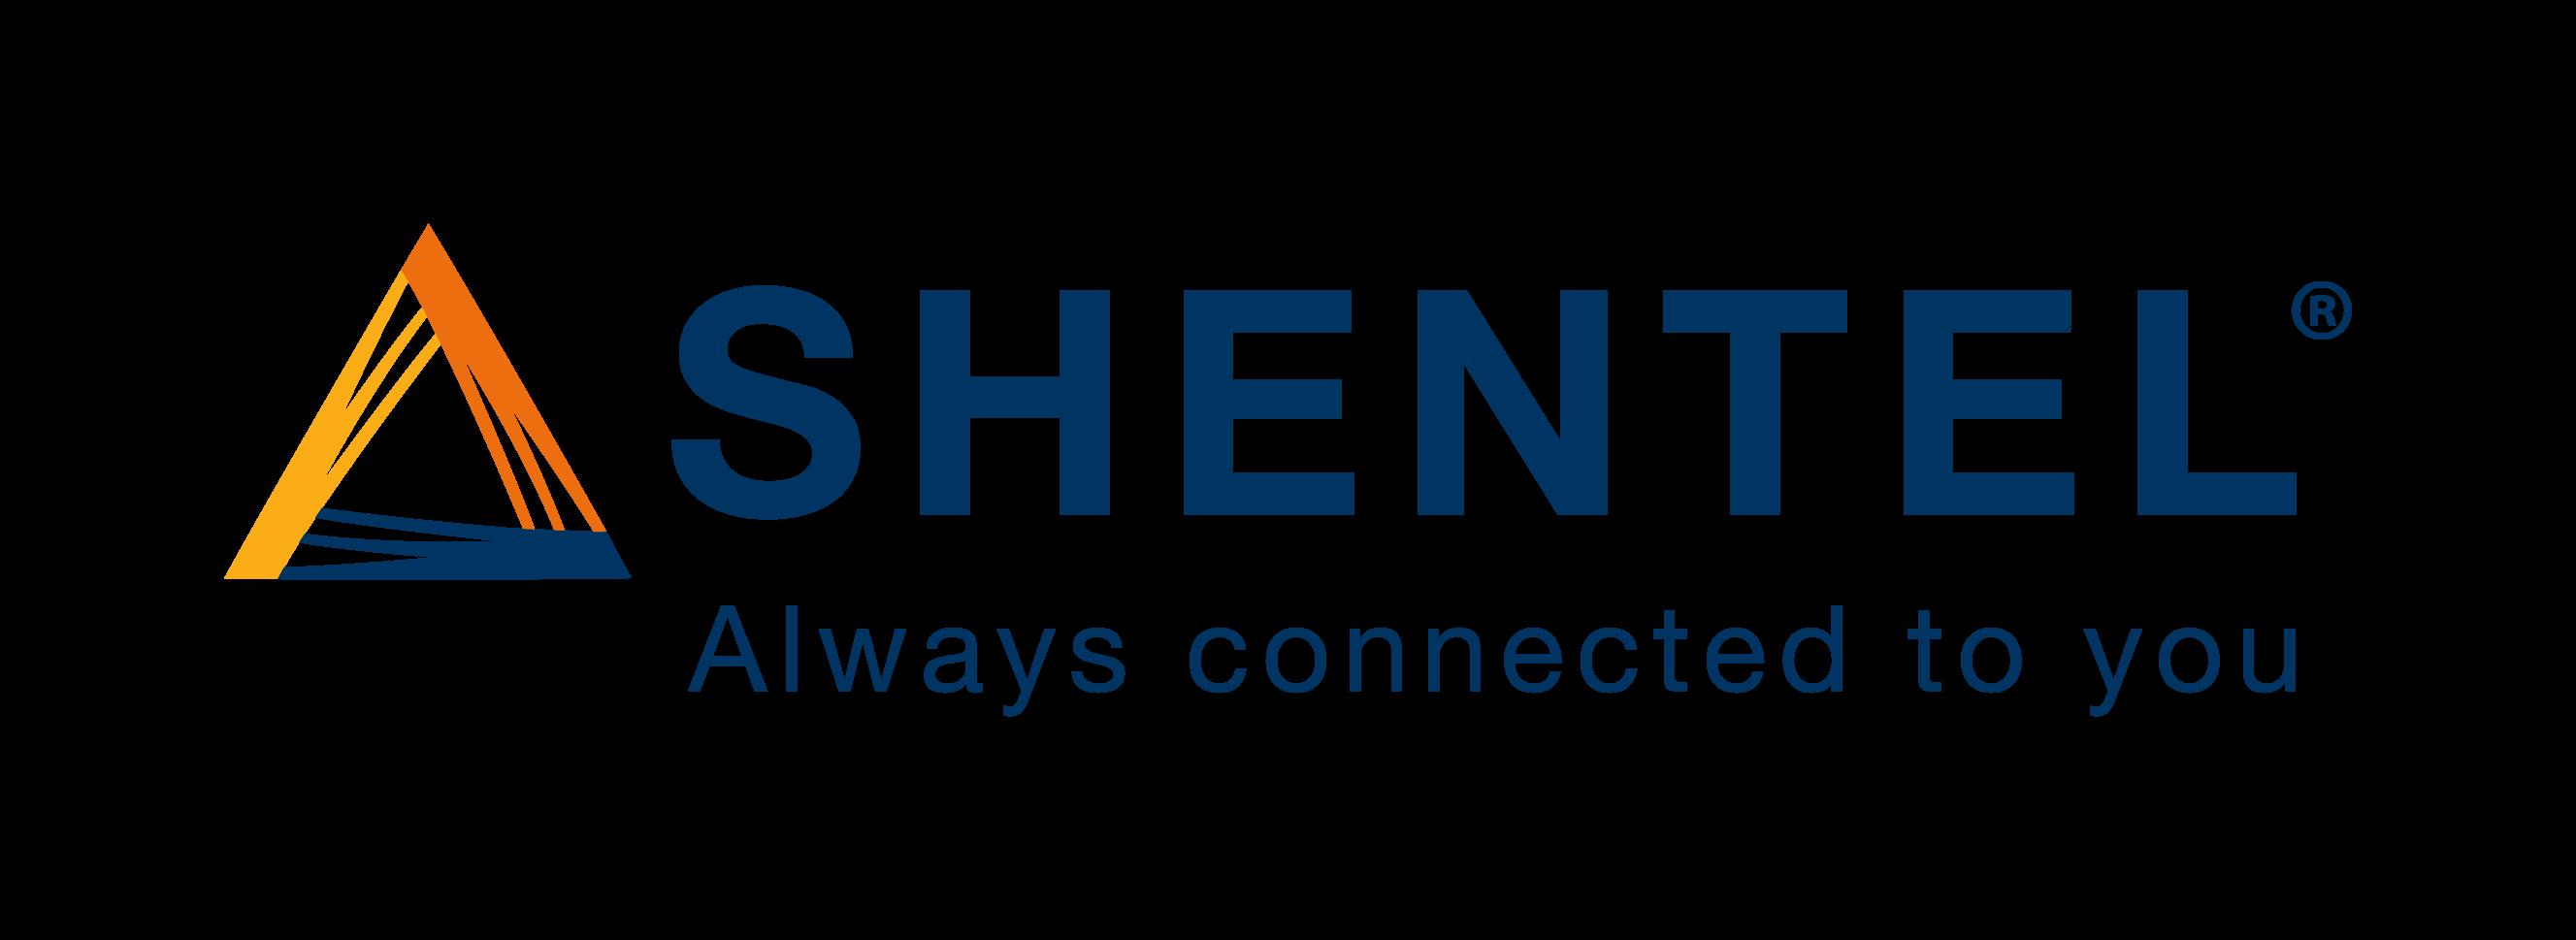 Shentel